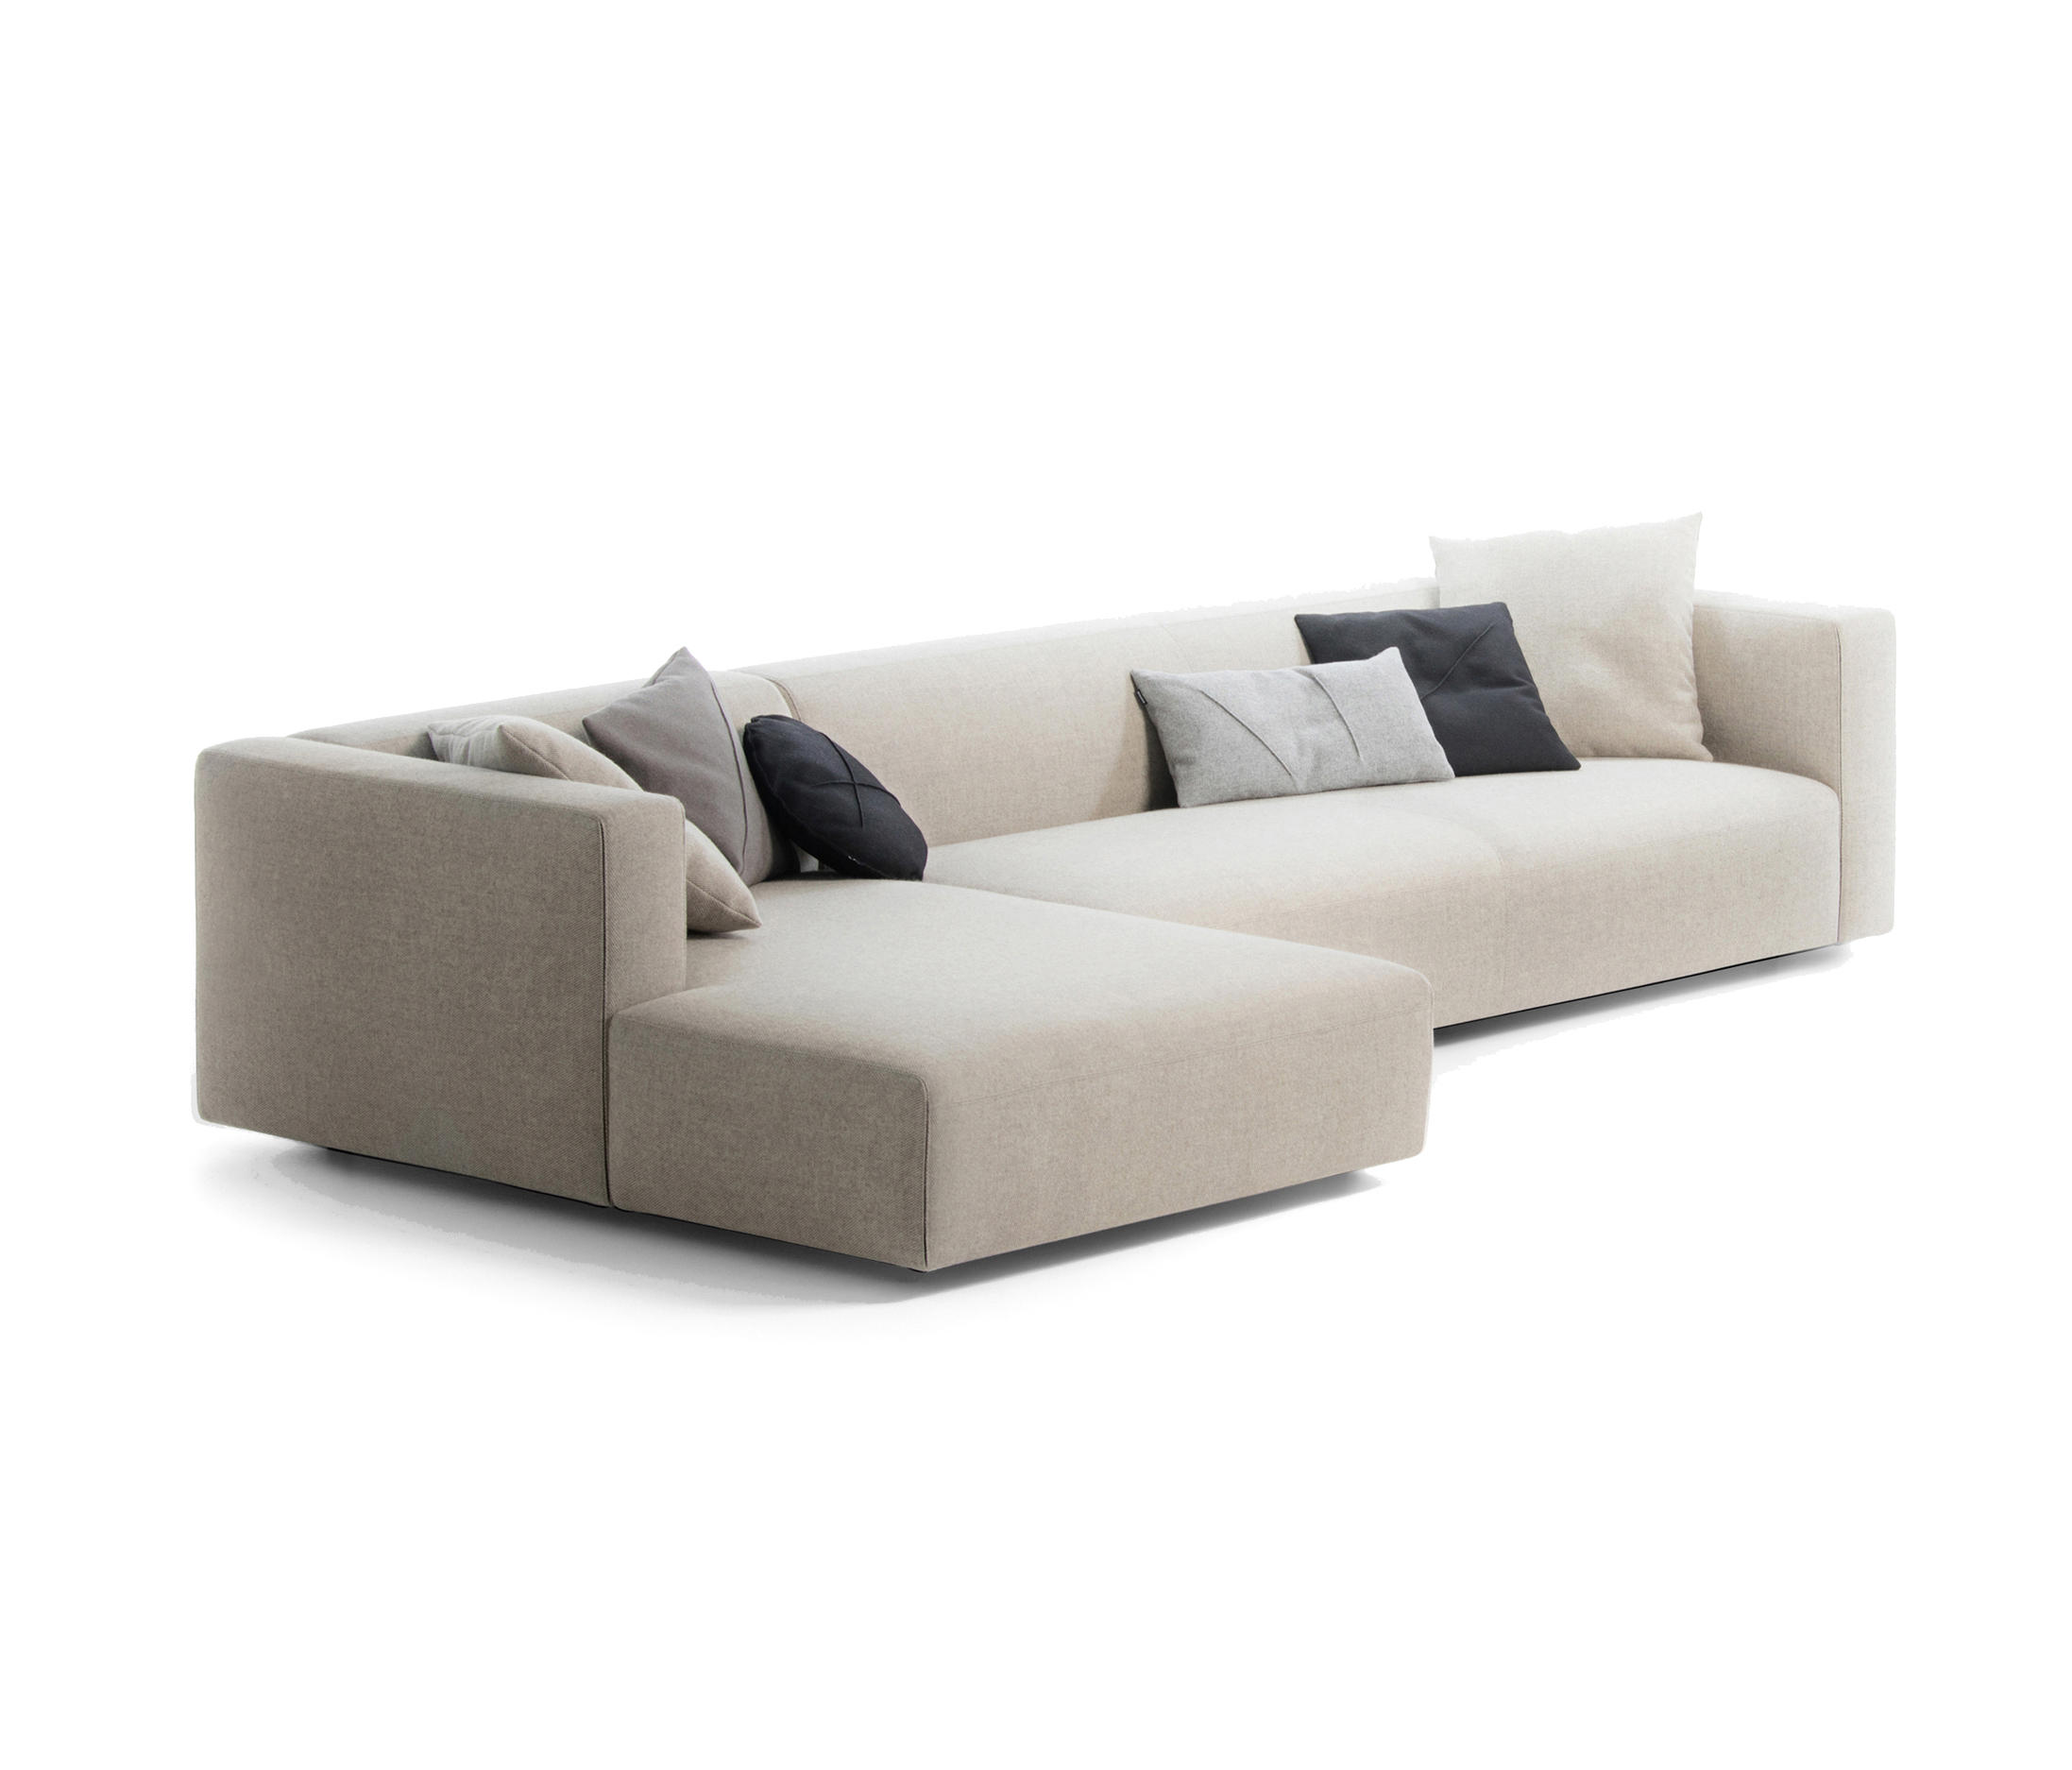 Match Modular Sofa By Prostoria